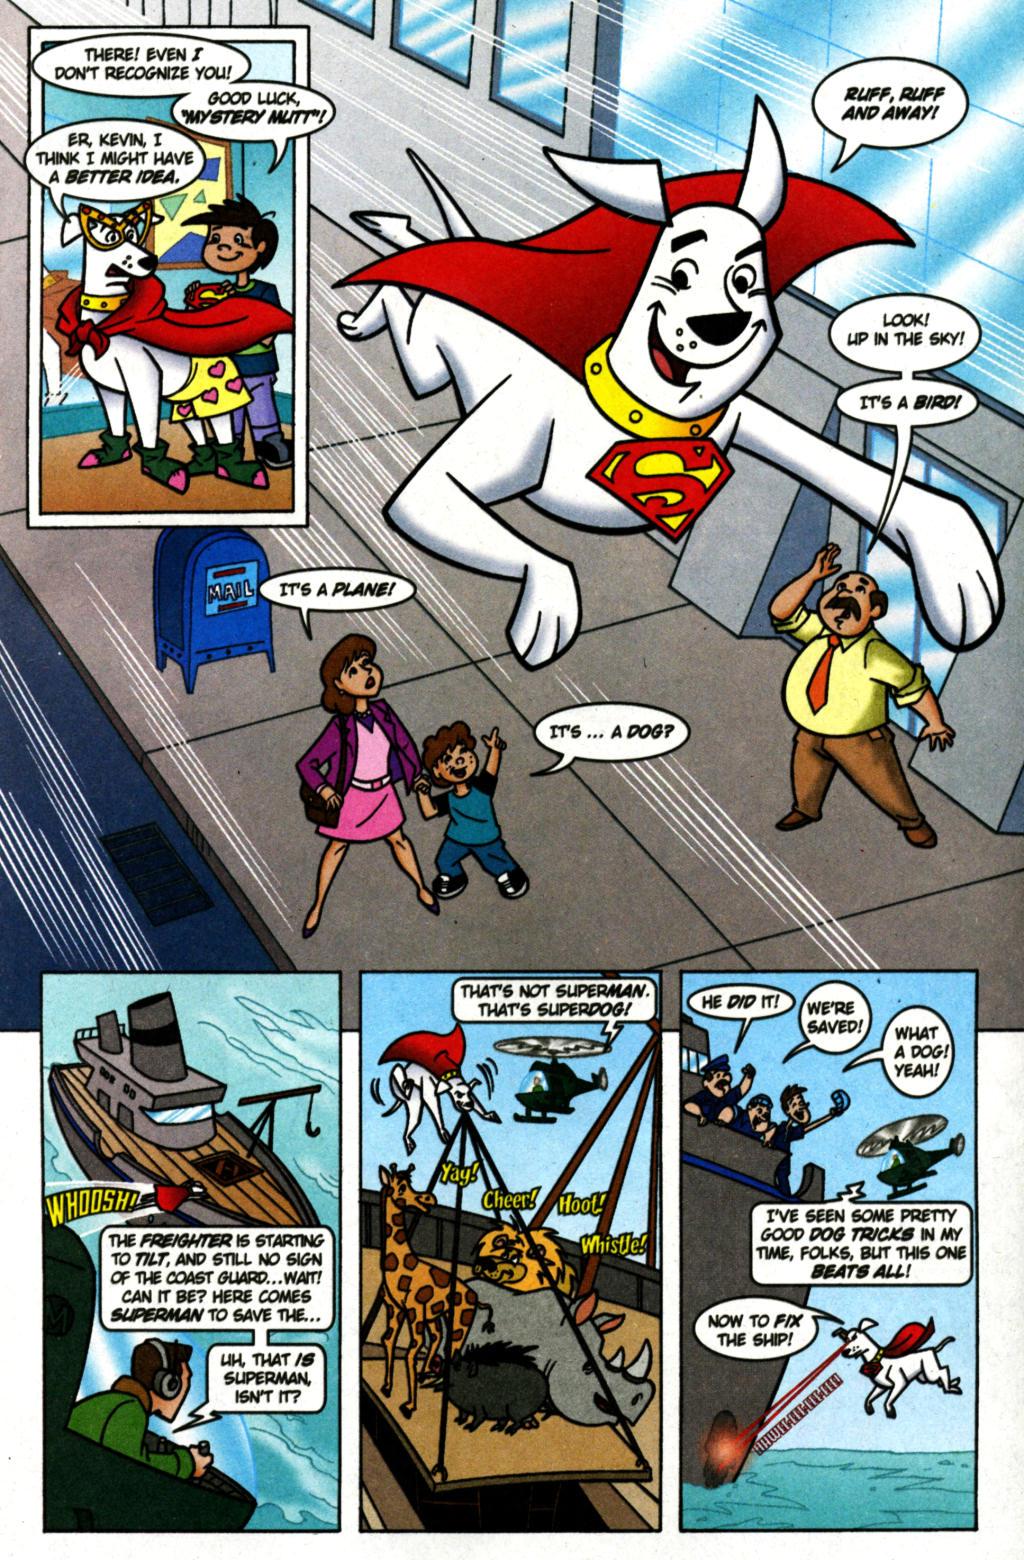 Read online Krypto the Superdog comic -  Issue #1 - 8